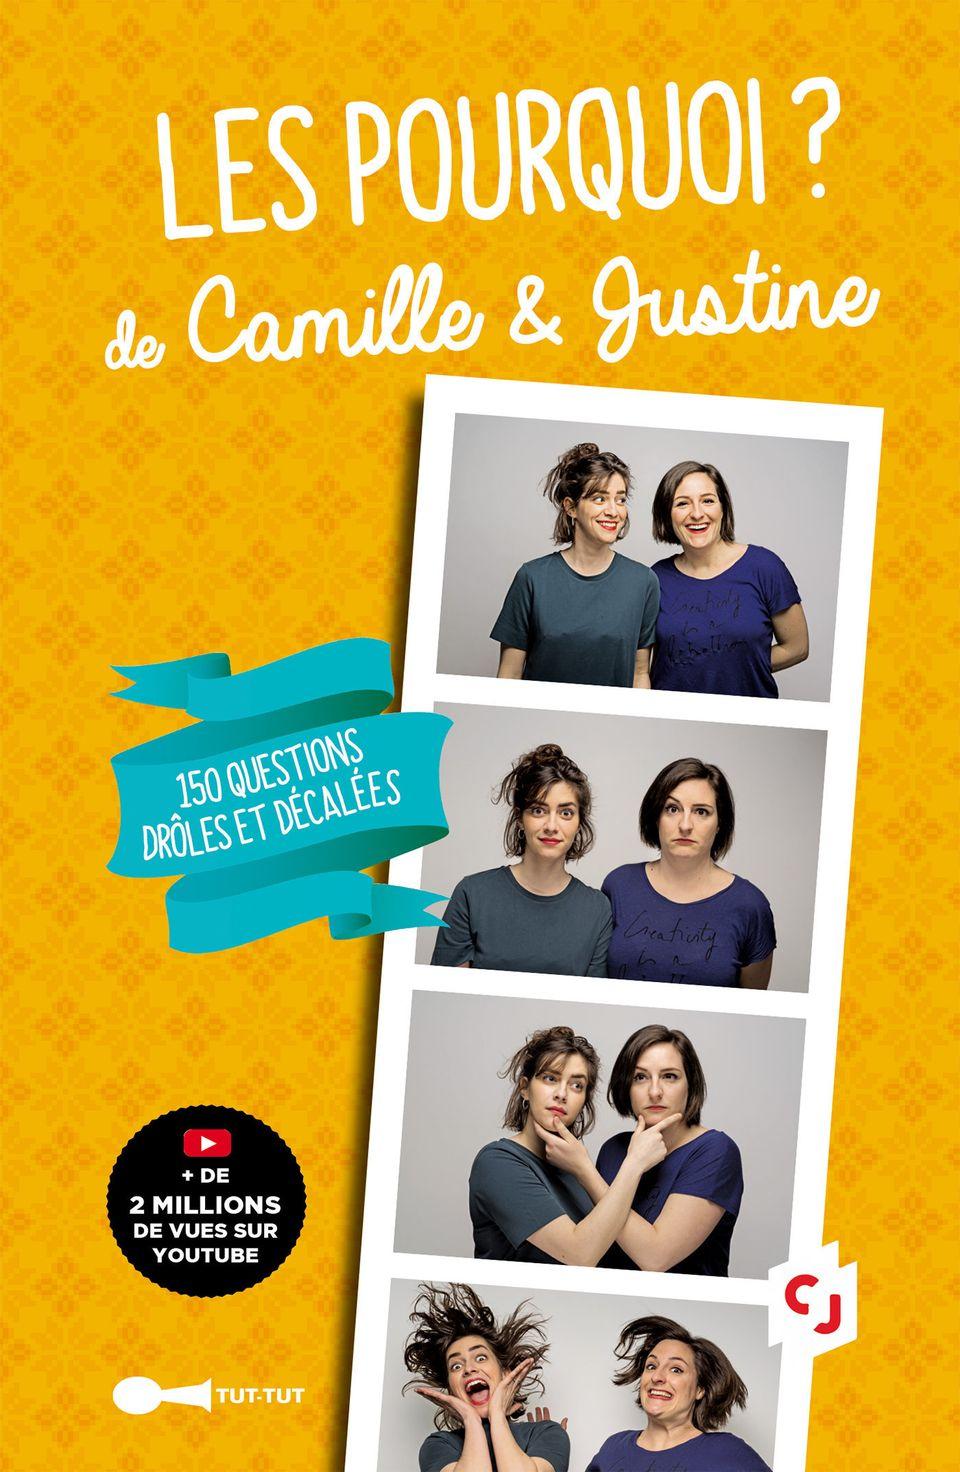 Camille et Justine: Les